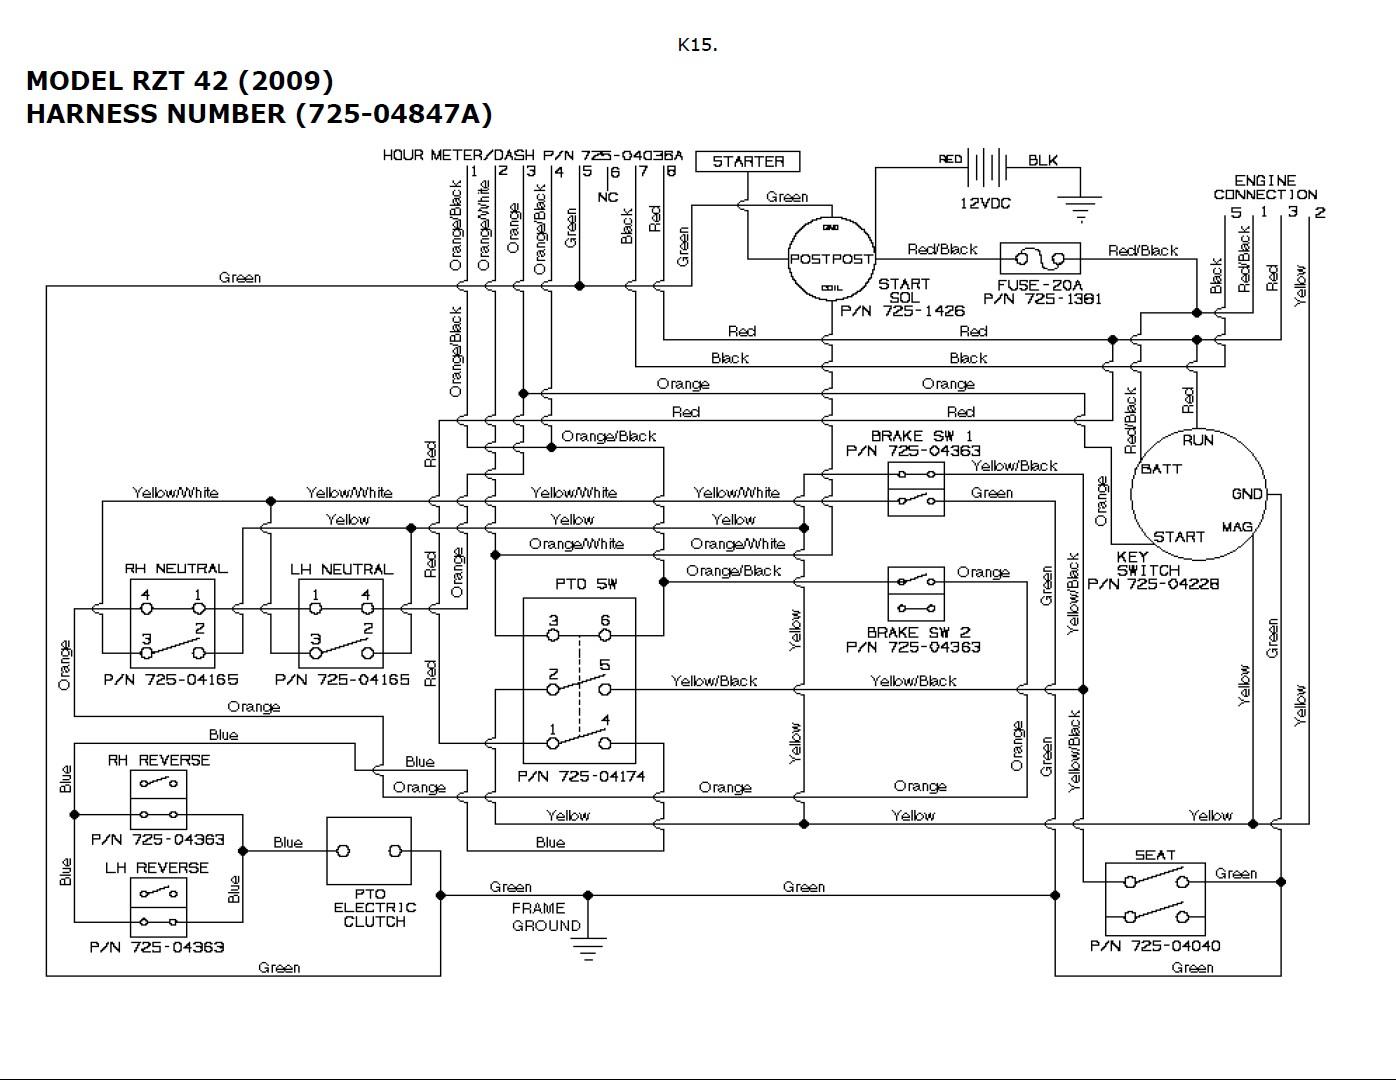 hight resolution of troy bilt solenoid wiring diagram basic wiring diagram u2022 rh rnetcomputer co troy bilt pony mower wiring diagram troy bilt pony 17 5 hp